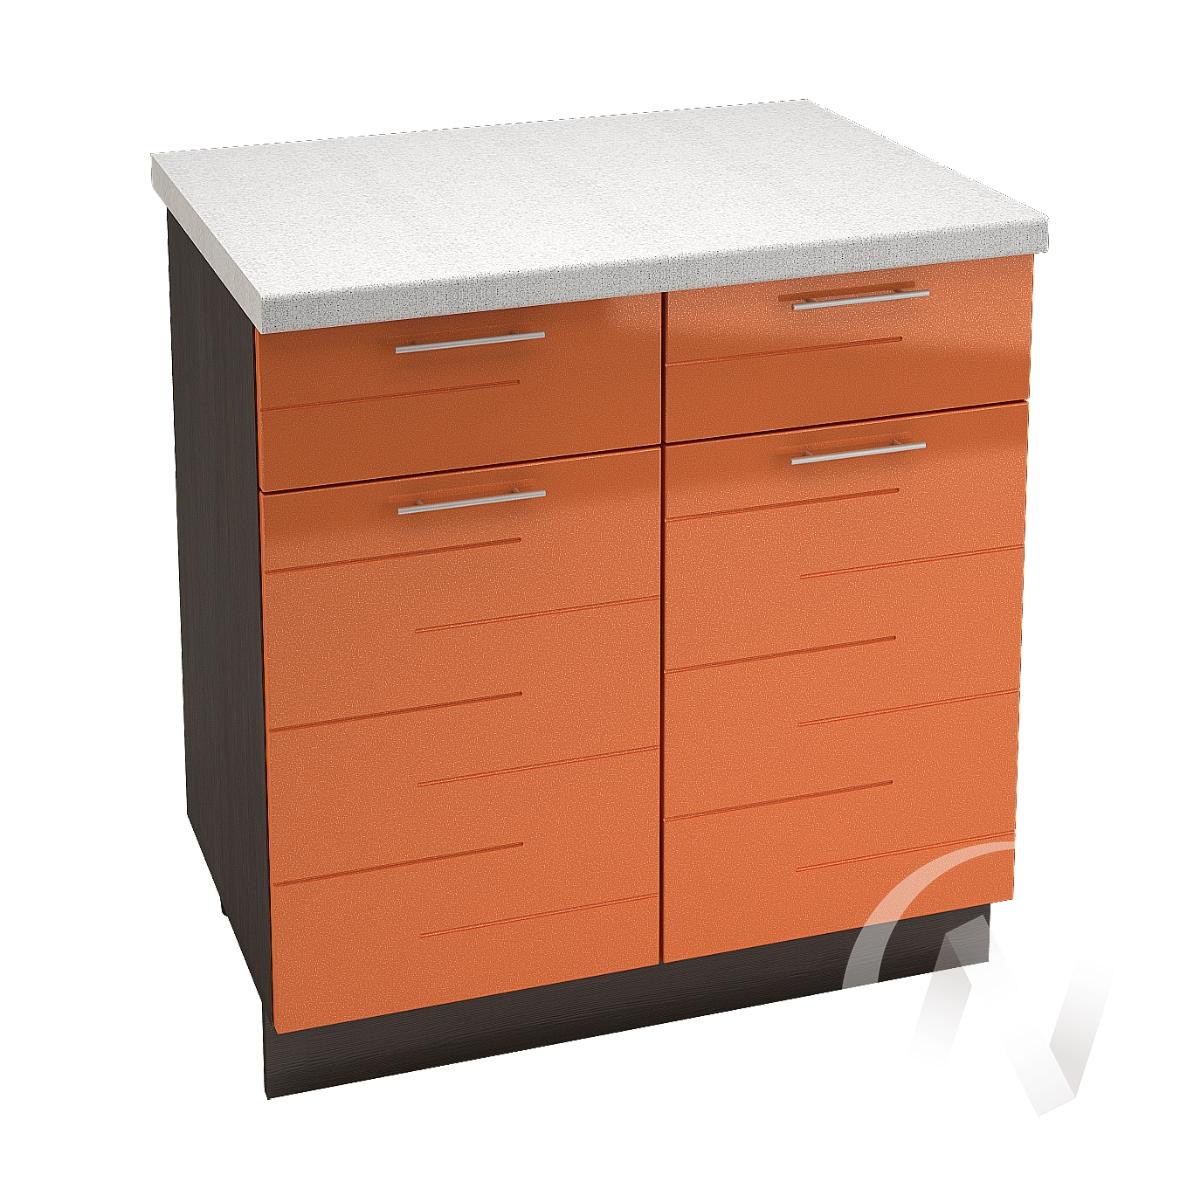 "Кухня ""Техно"": Шкаф нижний с ящиками 800, ШН1Я 800 (корпус венге)"